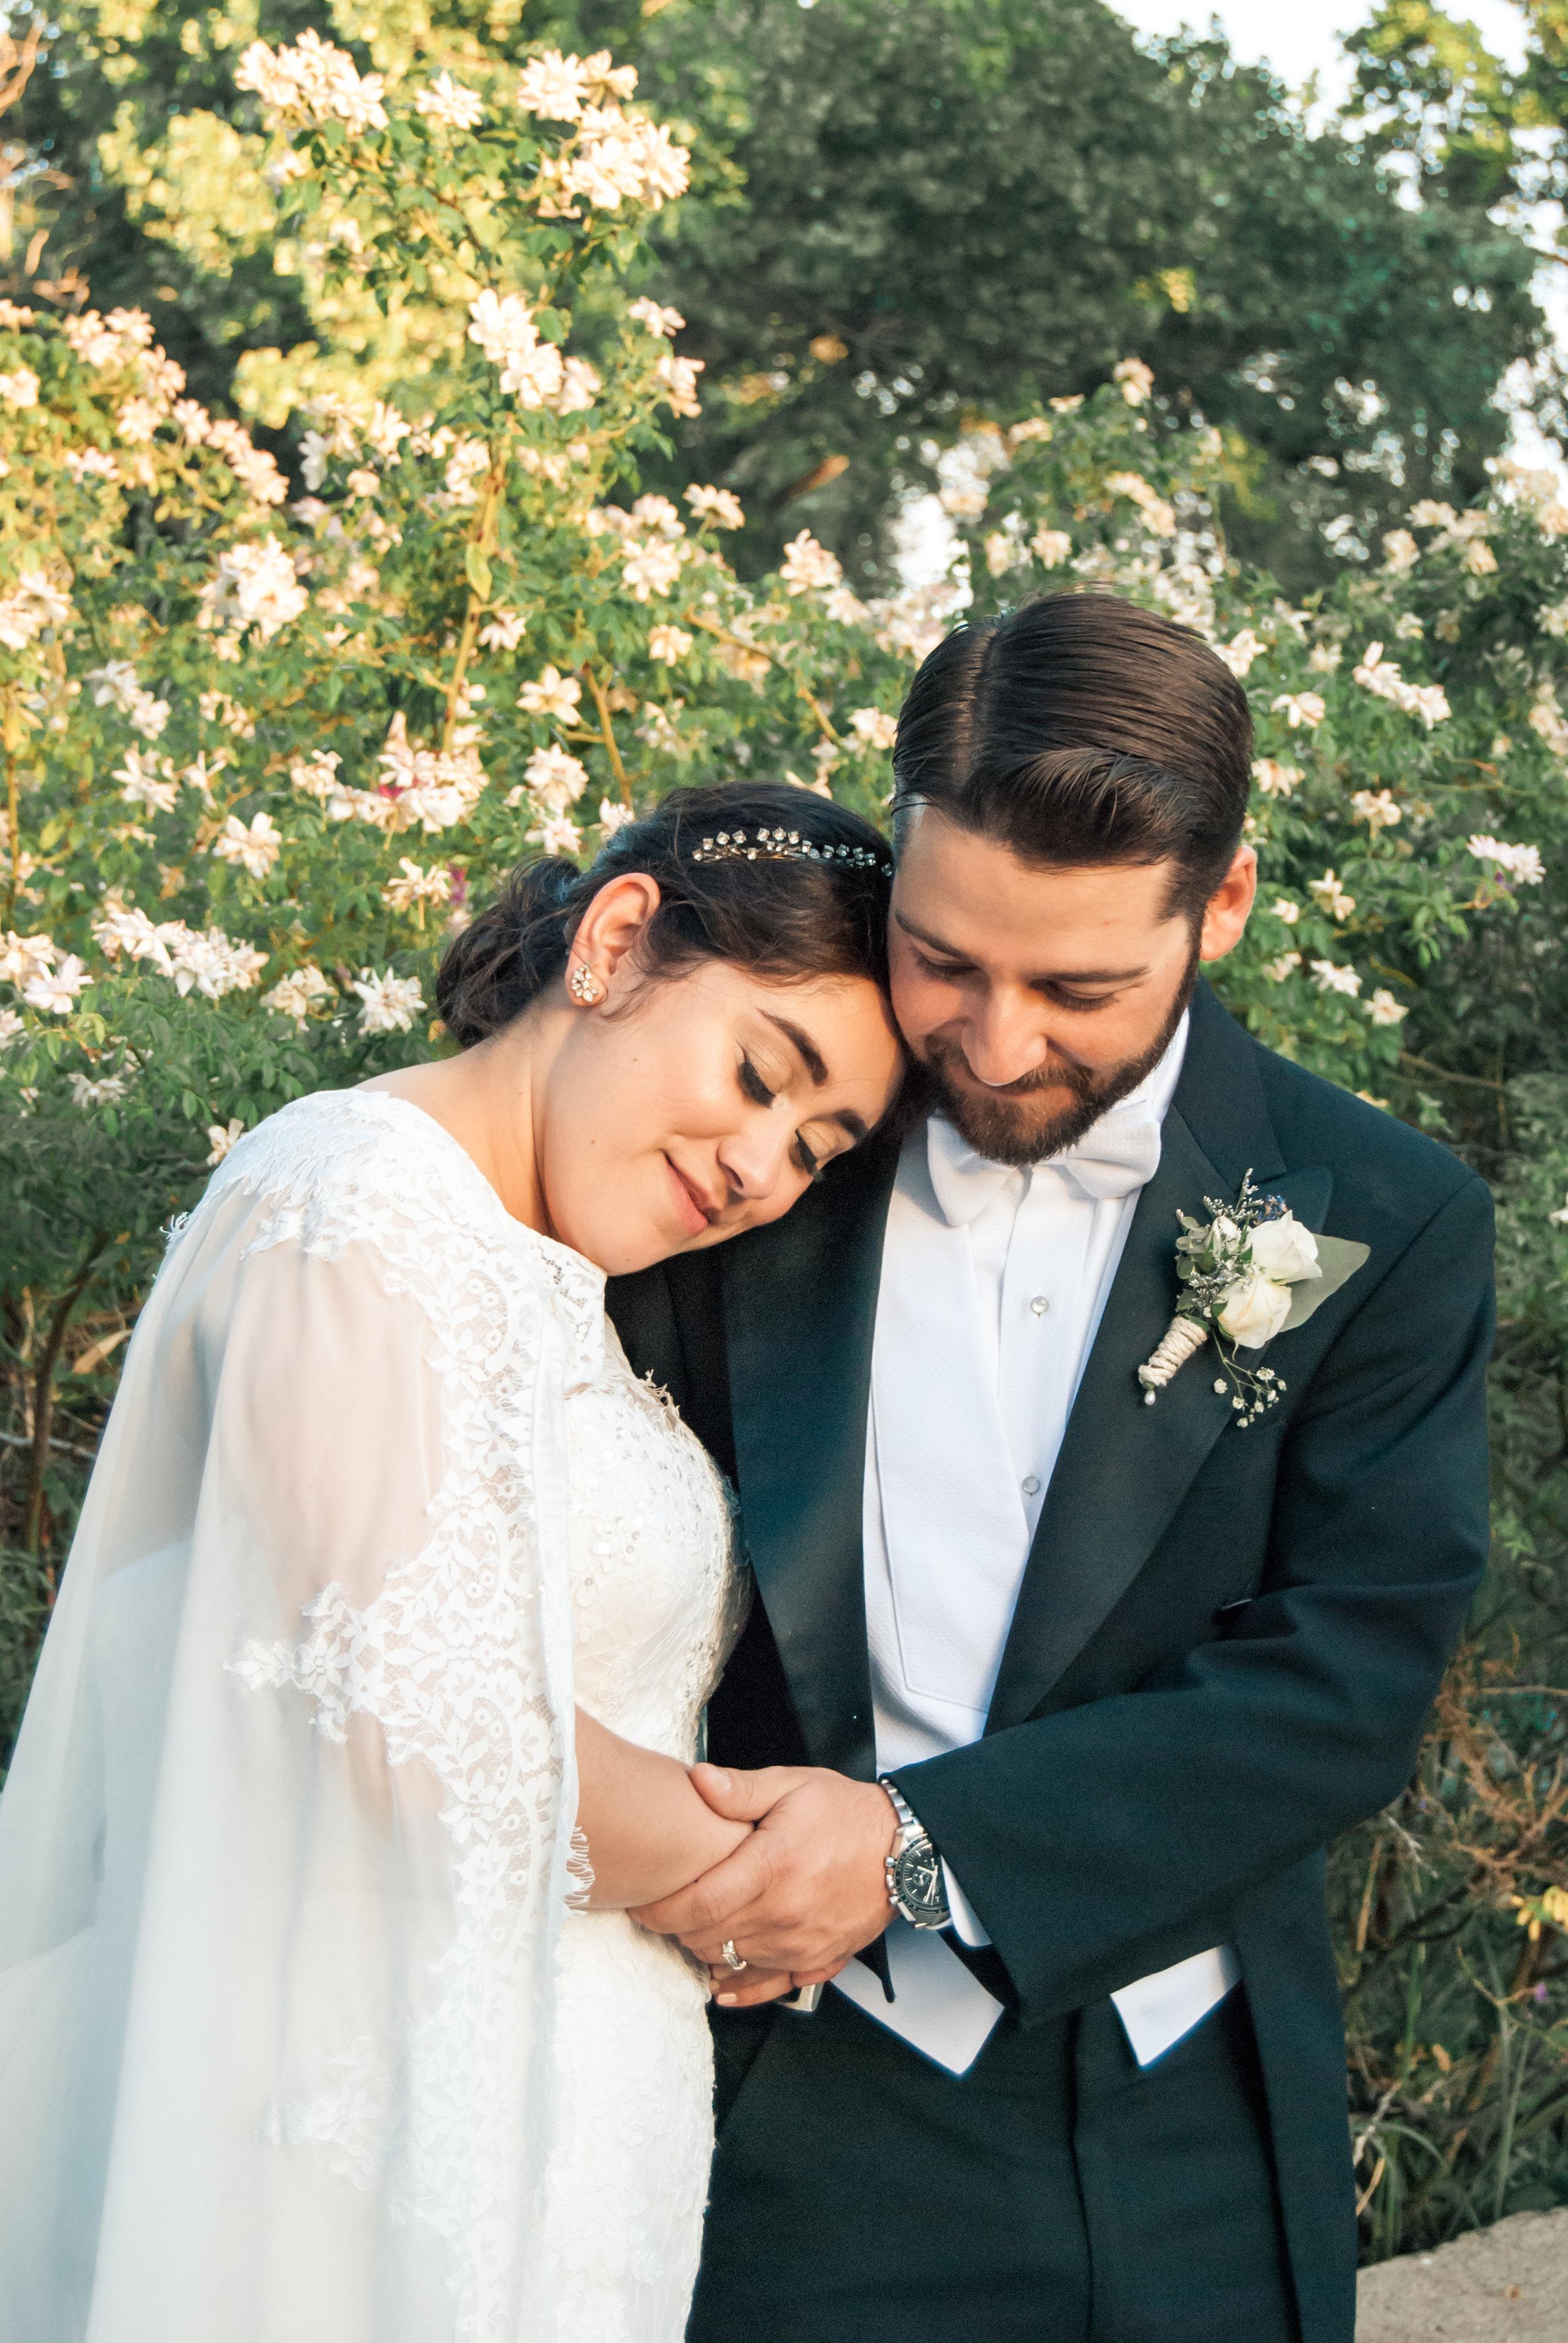 WeddingPortfolio-84.jpg